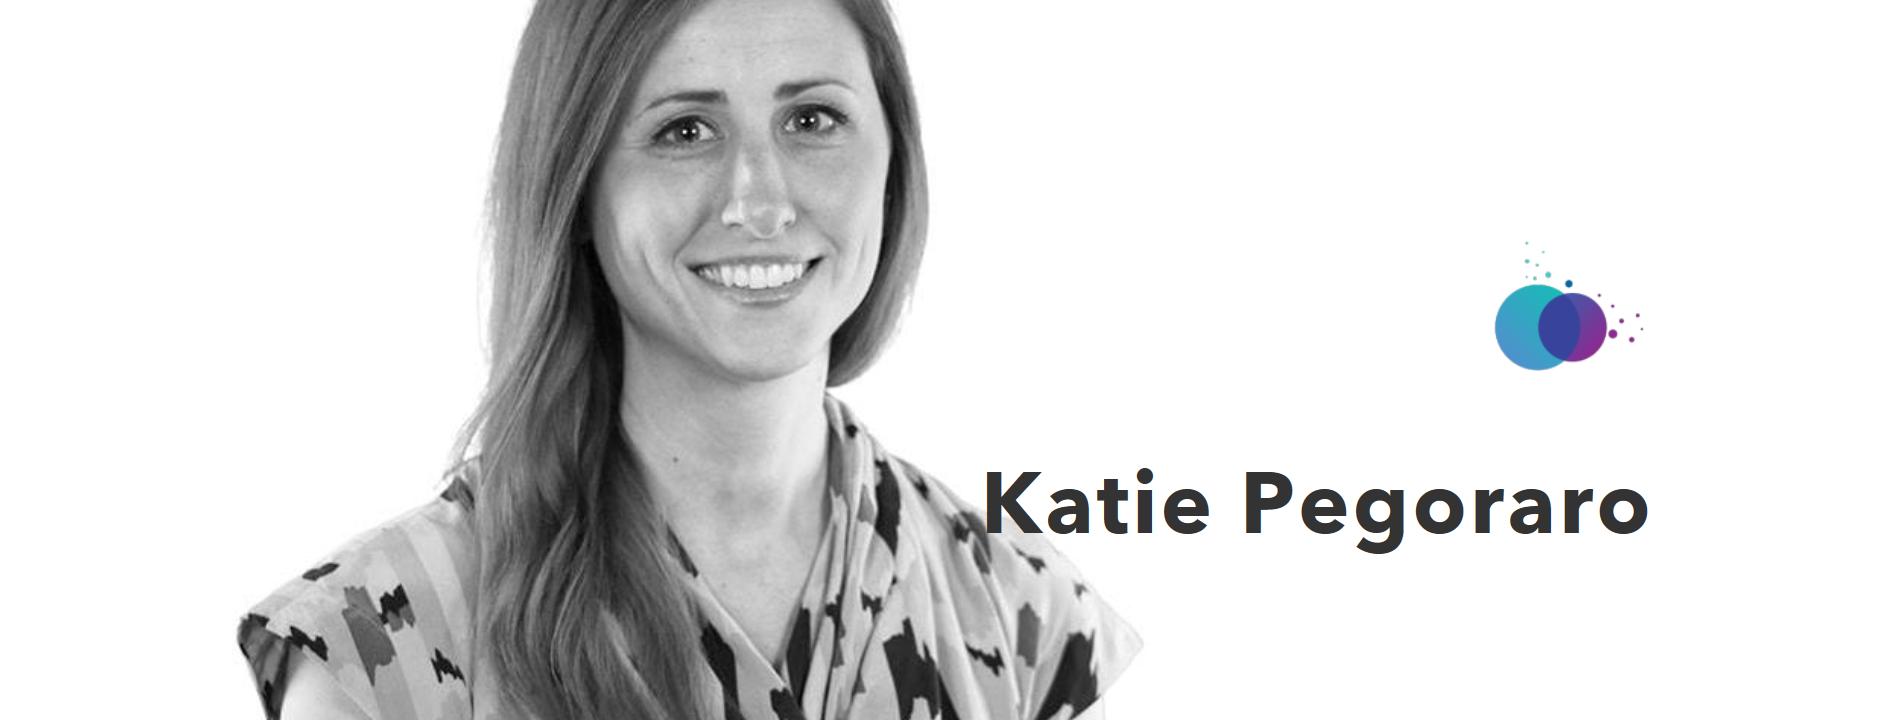 Katie Pegoraro shares her employee experience